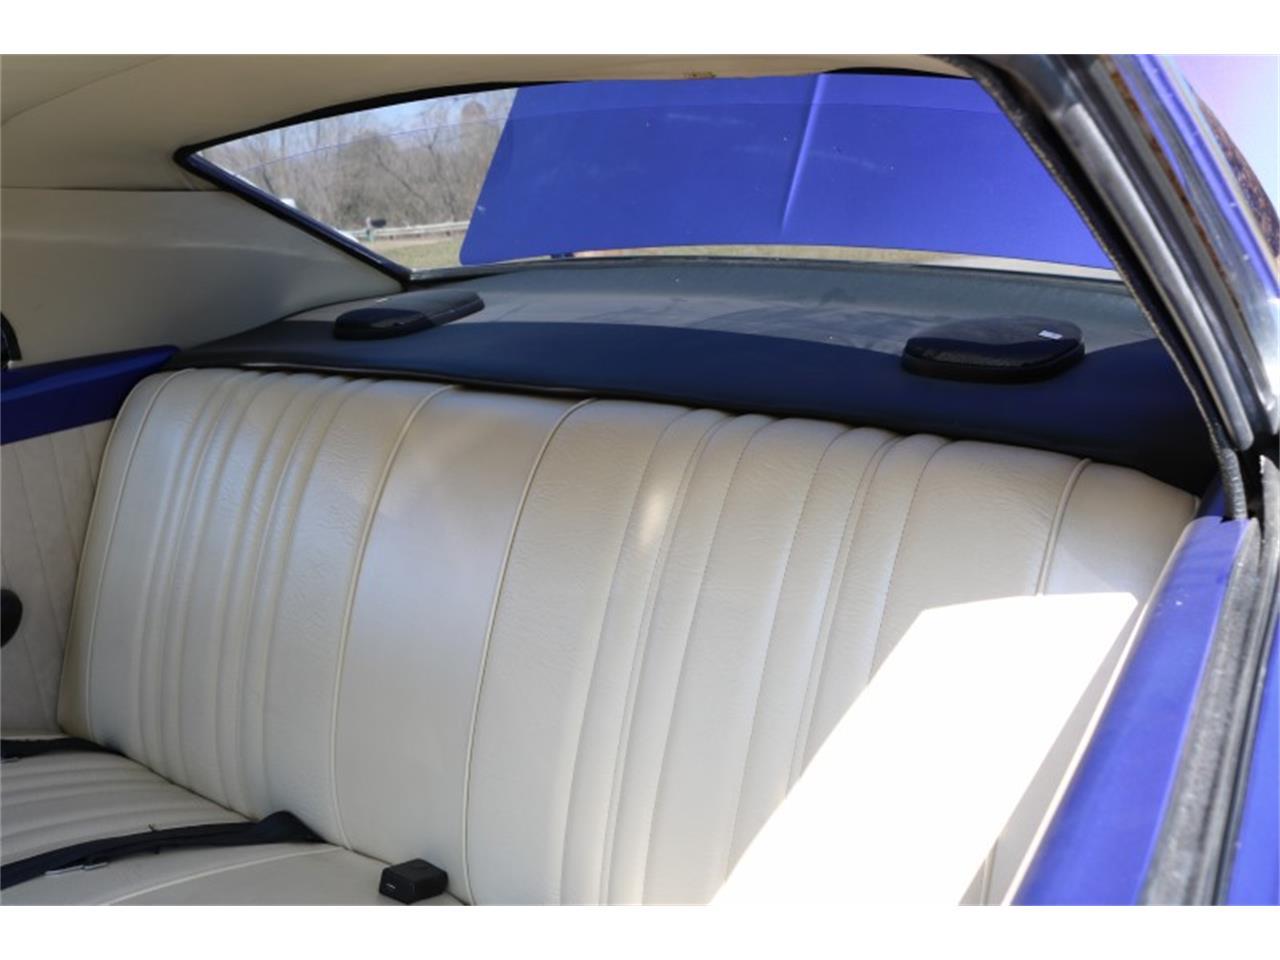 Large Picture of '68 Fairlane 500 located in Michigan - $12,500.00 - PU7R